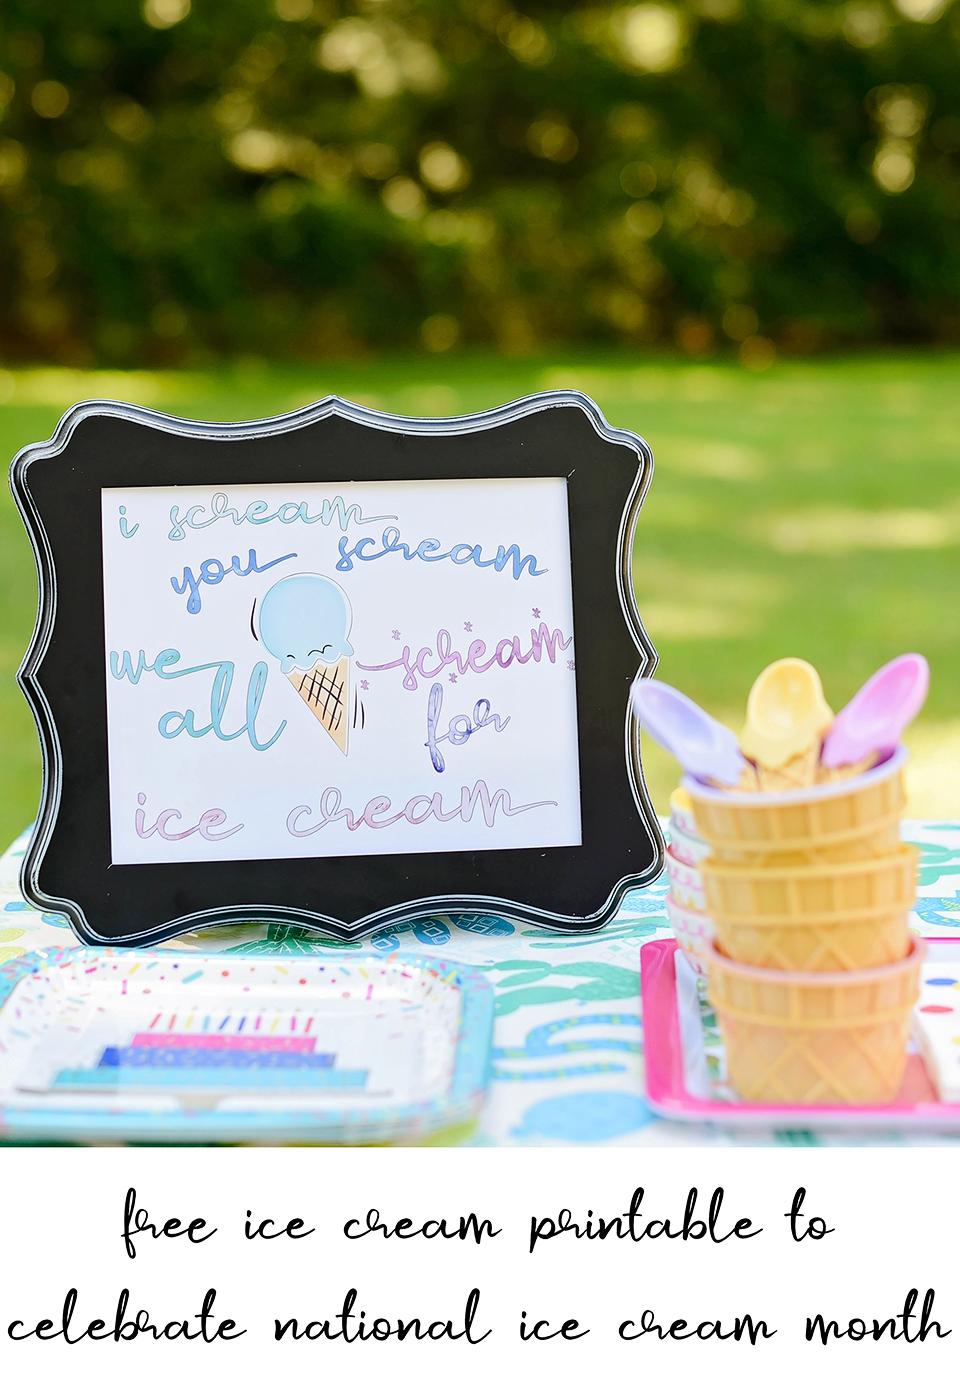 Free Ice Cream Printable to Celebrate National Ice Cream Month